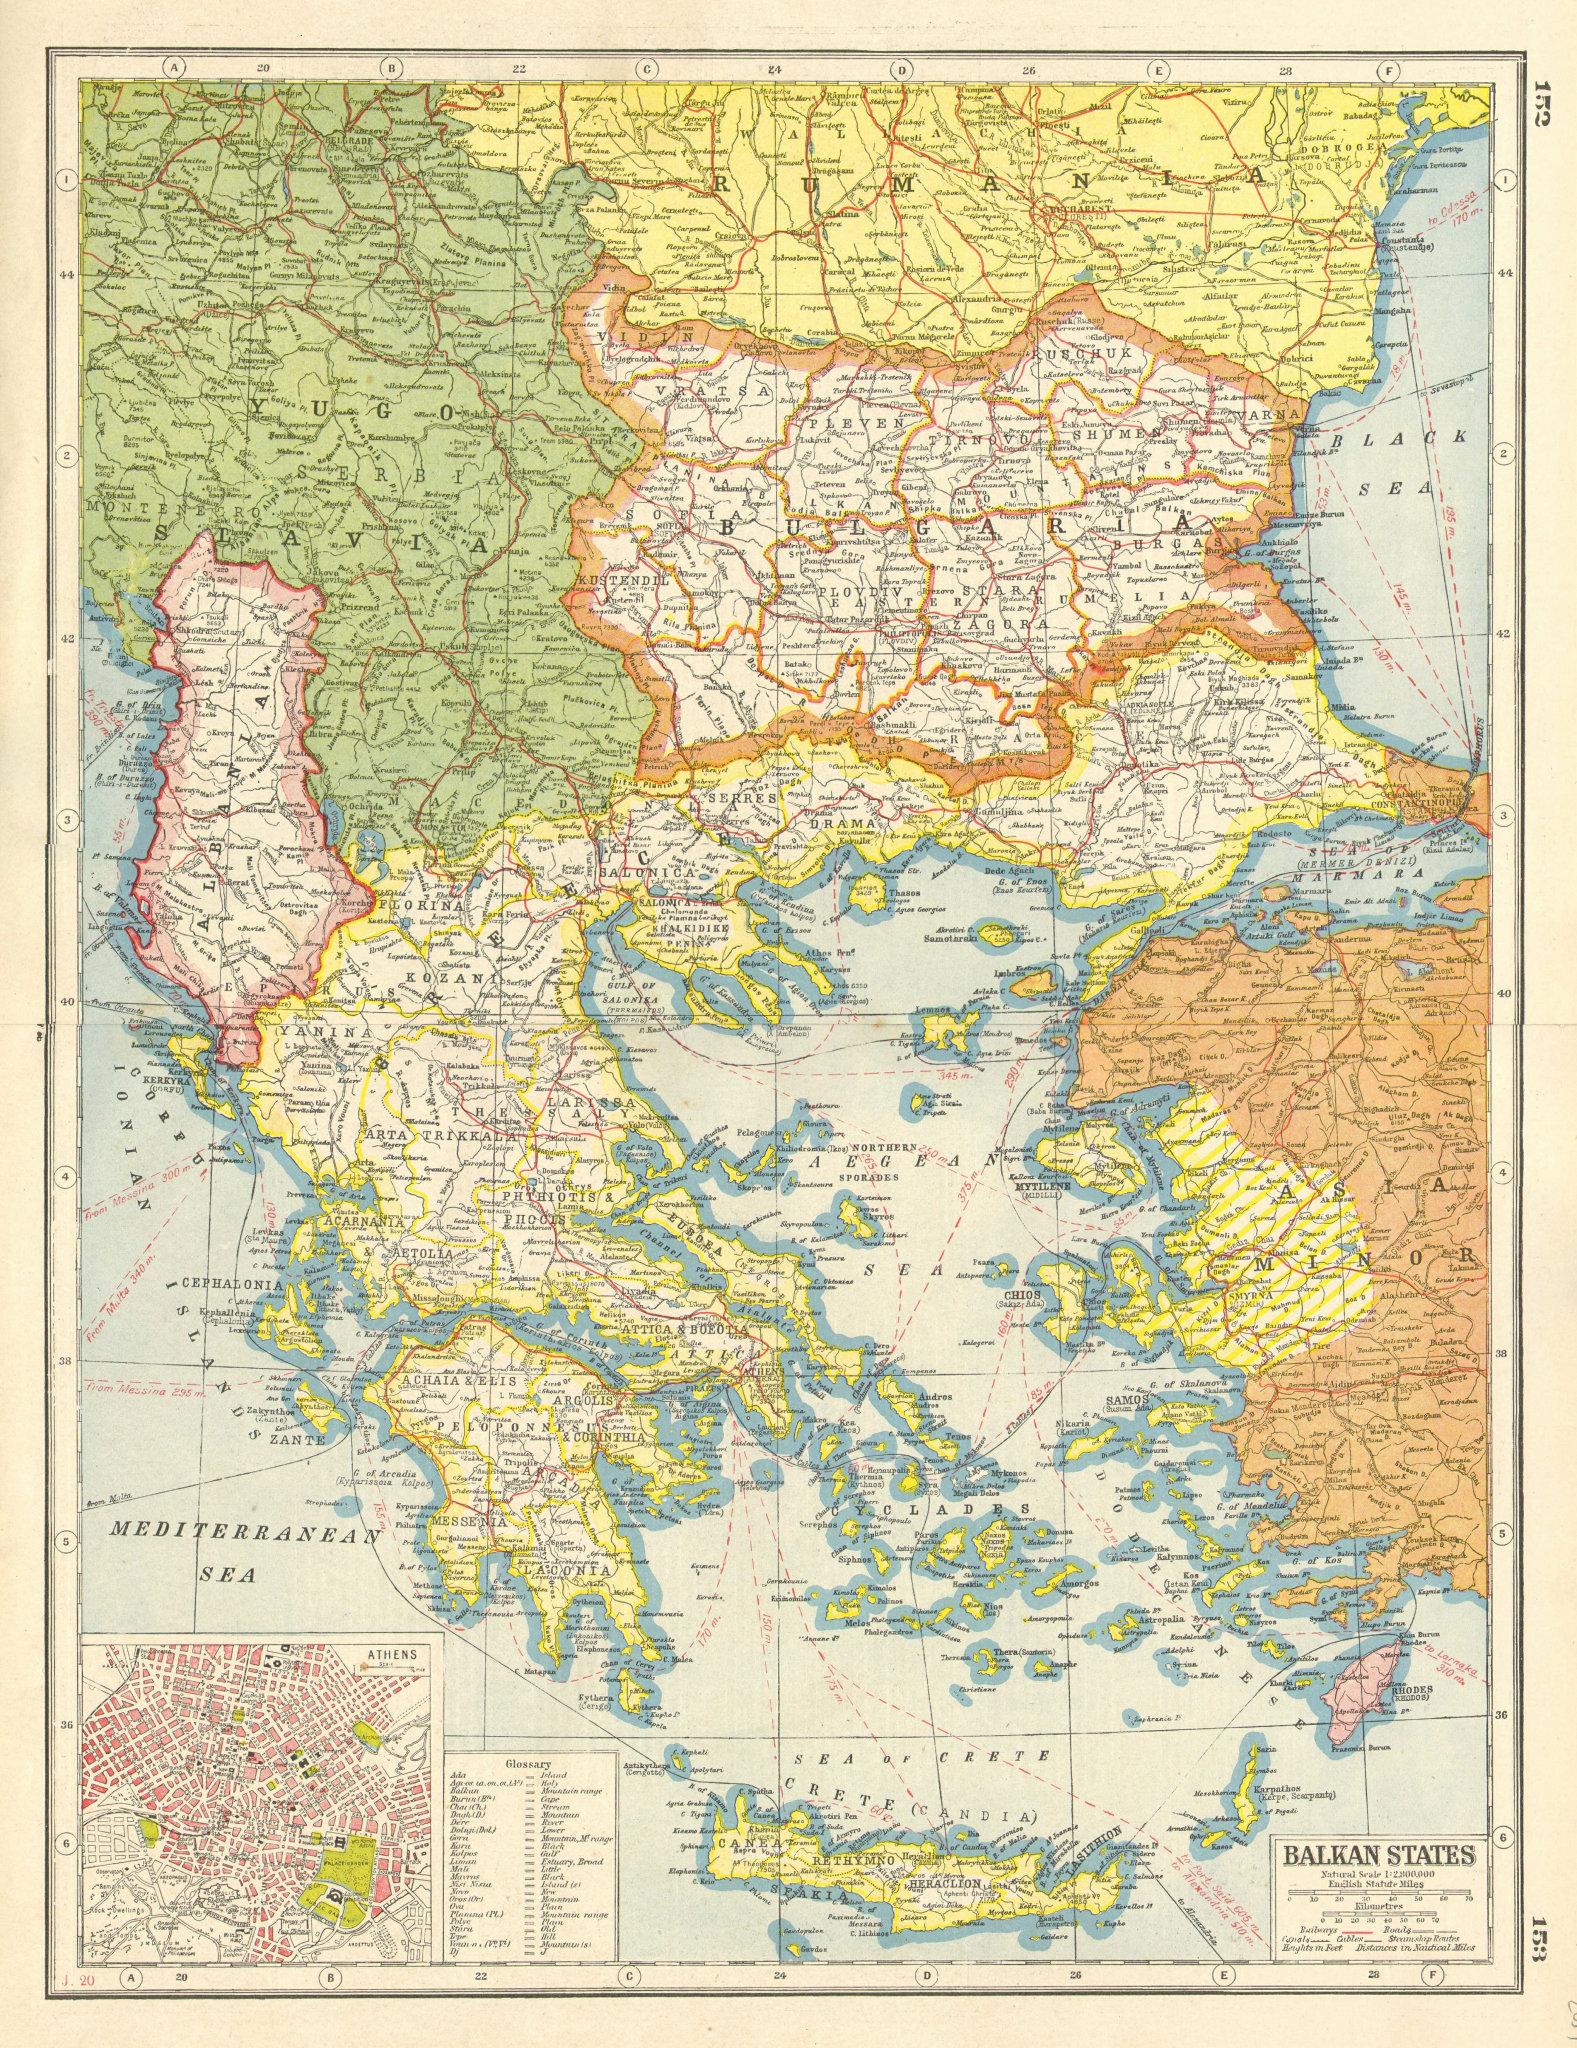 Associate Product BALKANS GREECE.  Bulgaria Albania Yugoslavia; Inset Athens. HARMSWORTH 1920 map